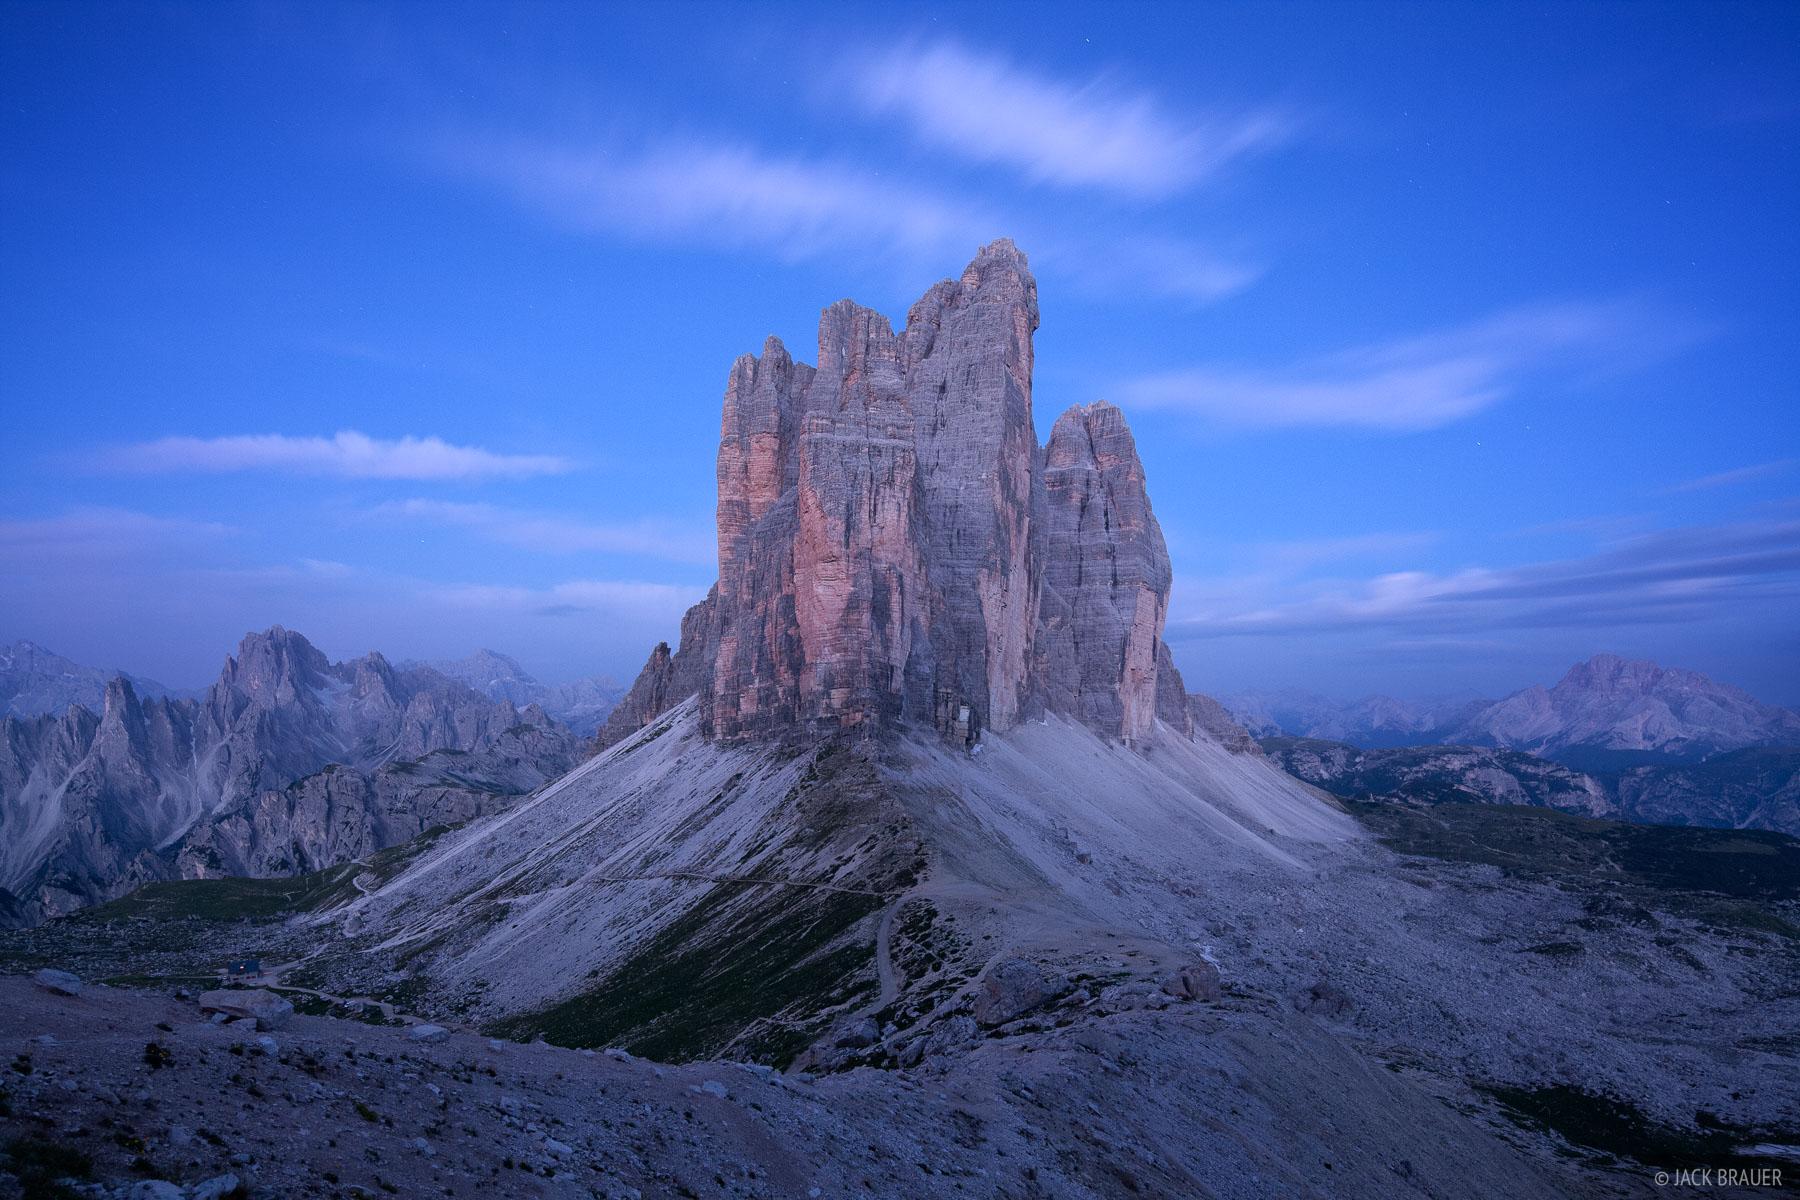 Dolomites, Italy, Tre Cime, Lavaredo, Drei Zinnen, Alps, photo